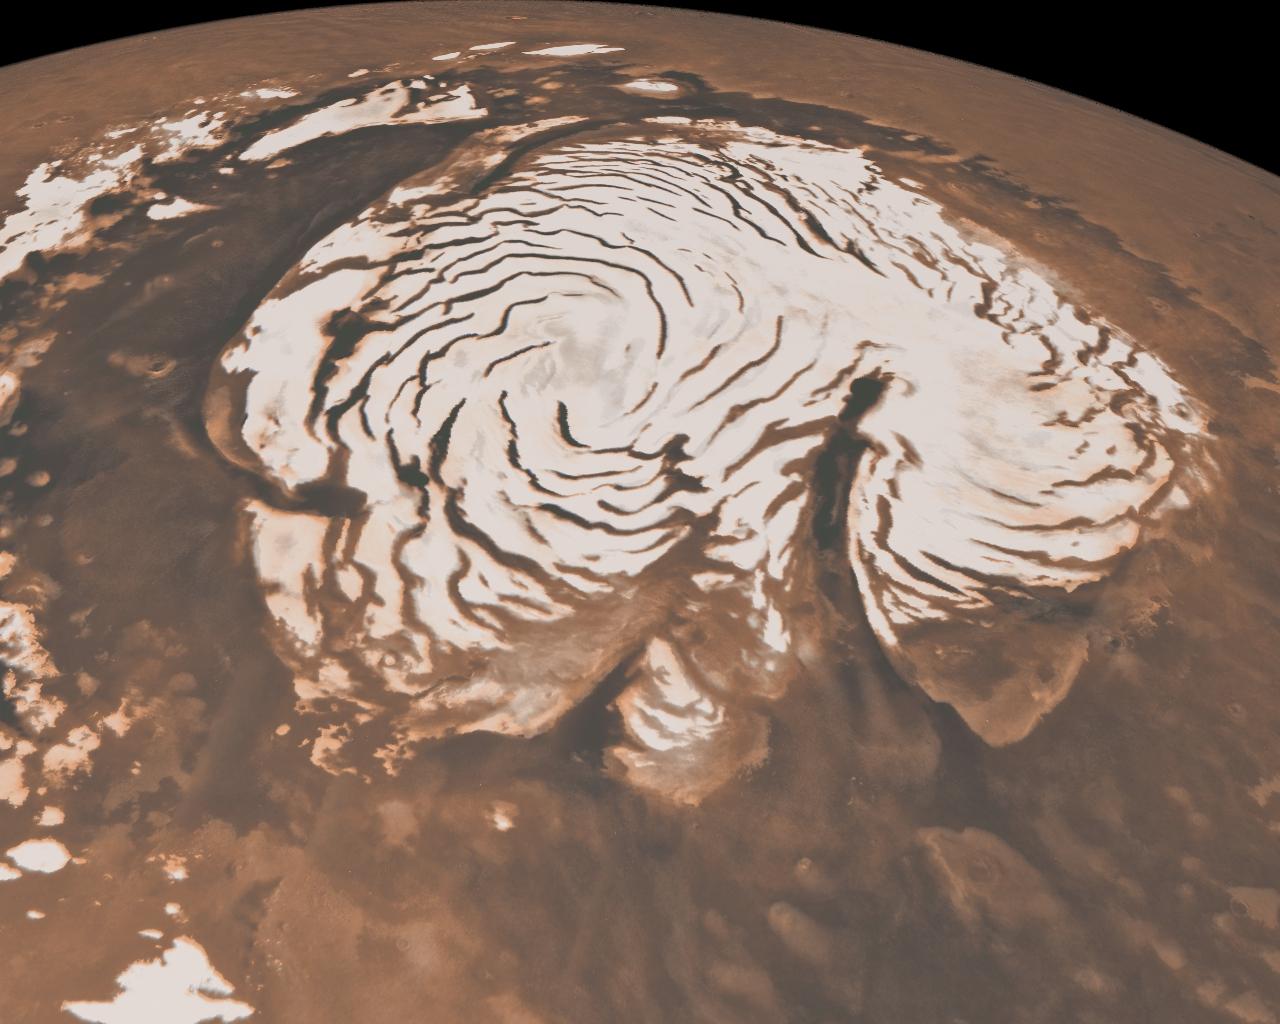 Northern Ice Cap of Mars Credit: NASA/JPL-Caltech/MSSS